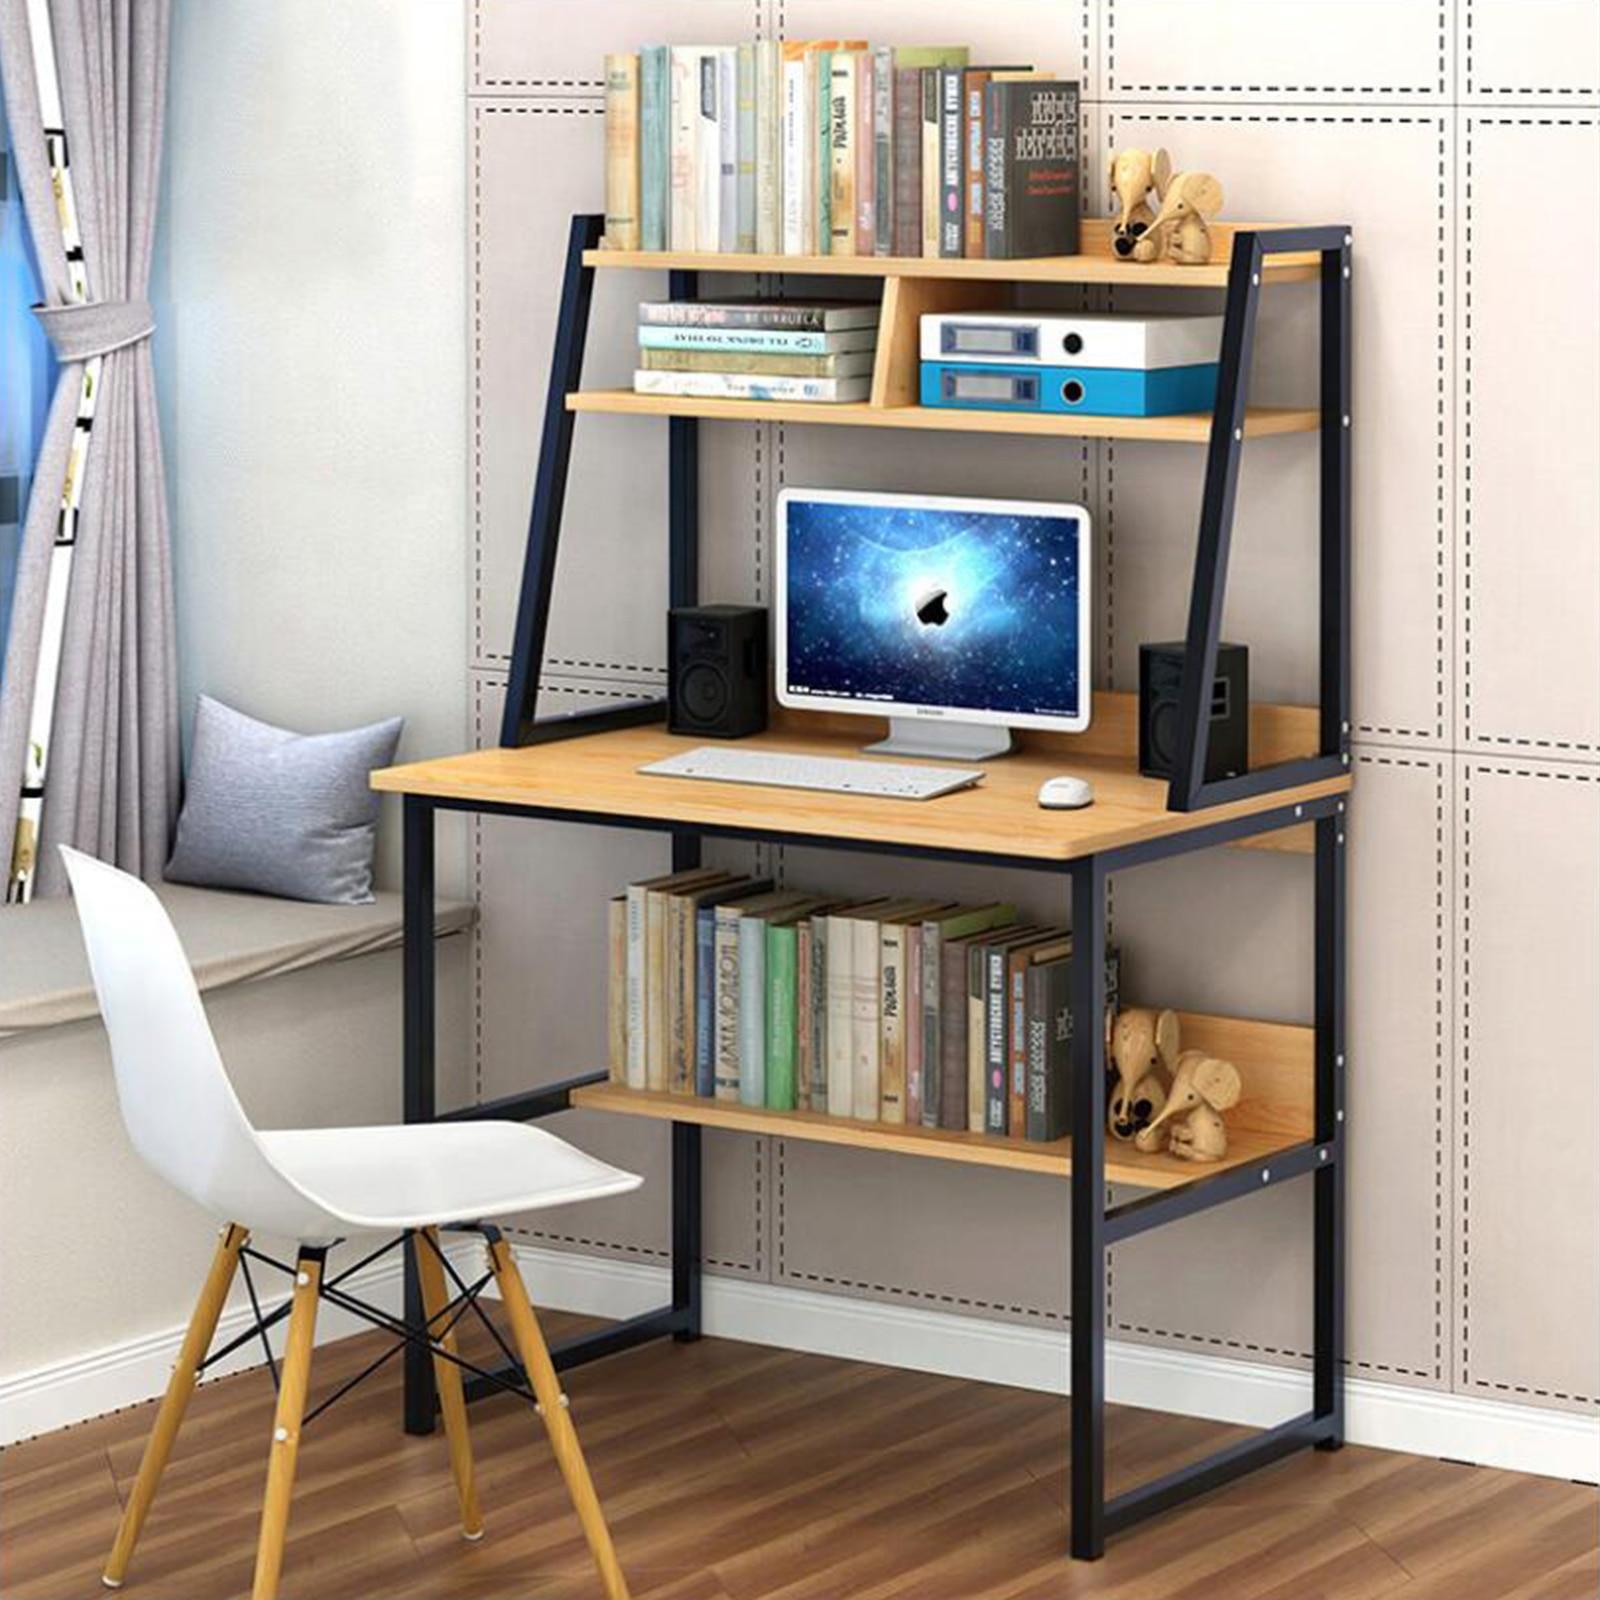 Corner Desk 4 Tier Shelves Computer PC Laptop Office Home Study Table Furniture